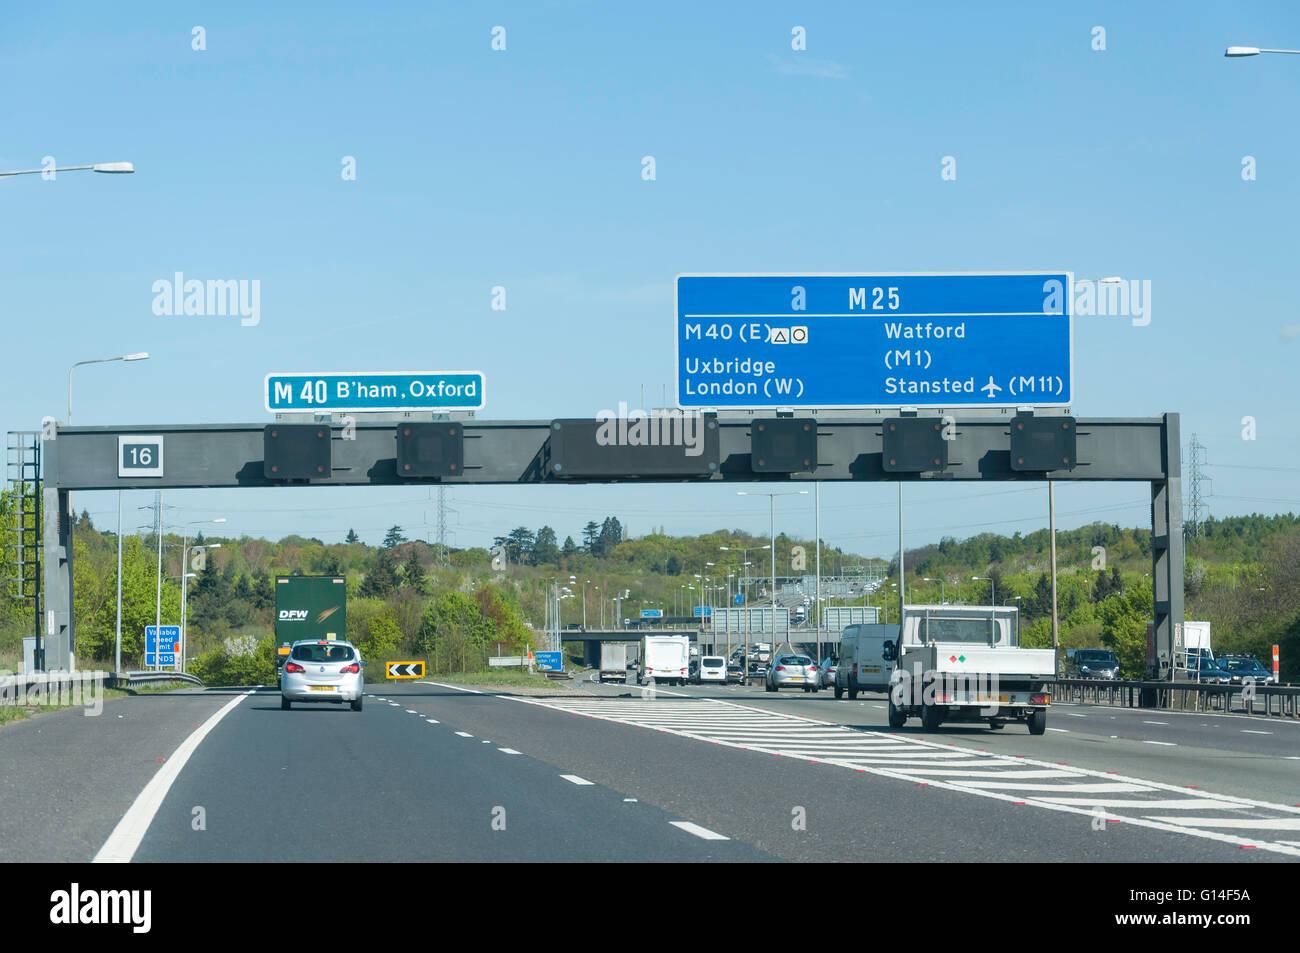 M40 exit on M25 motorway, Surrey, England, United Kingdom - Stock Image